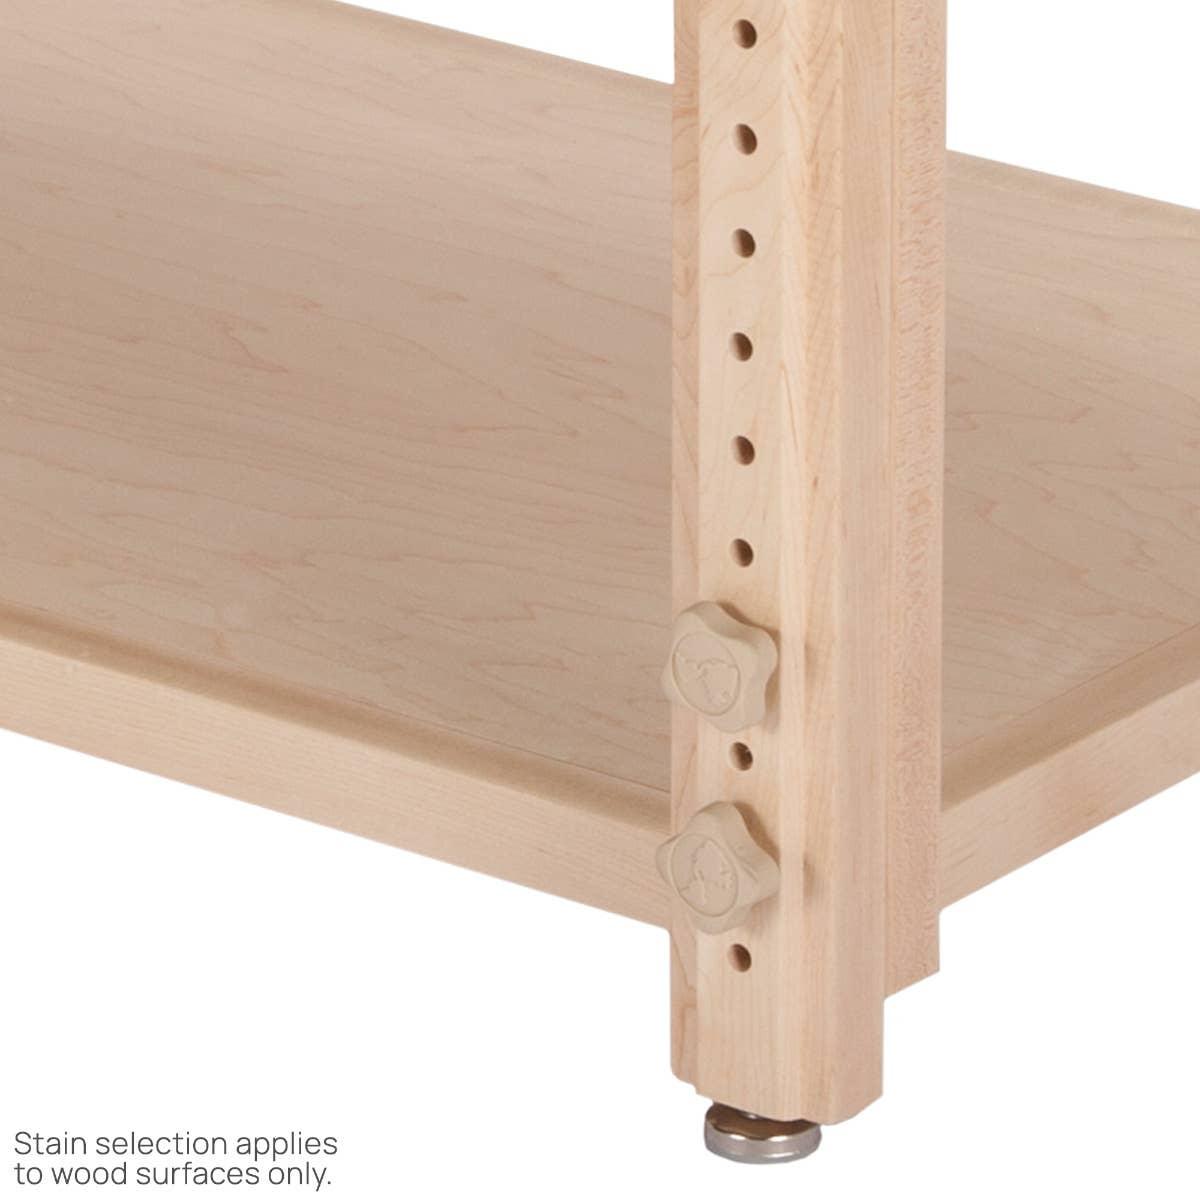 sedona_shelf_-_wood_stain_info